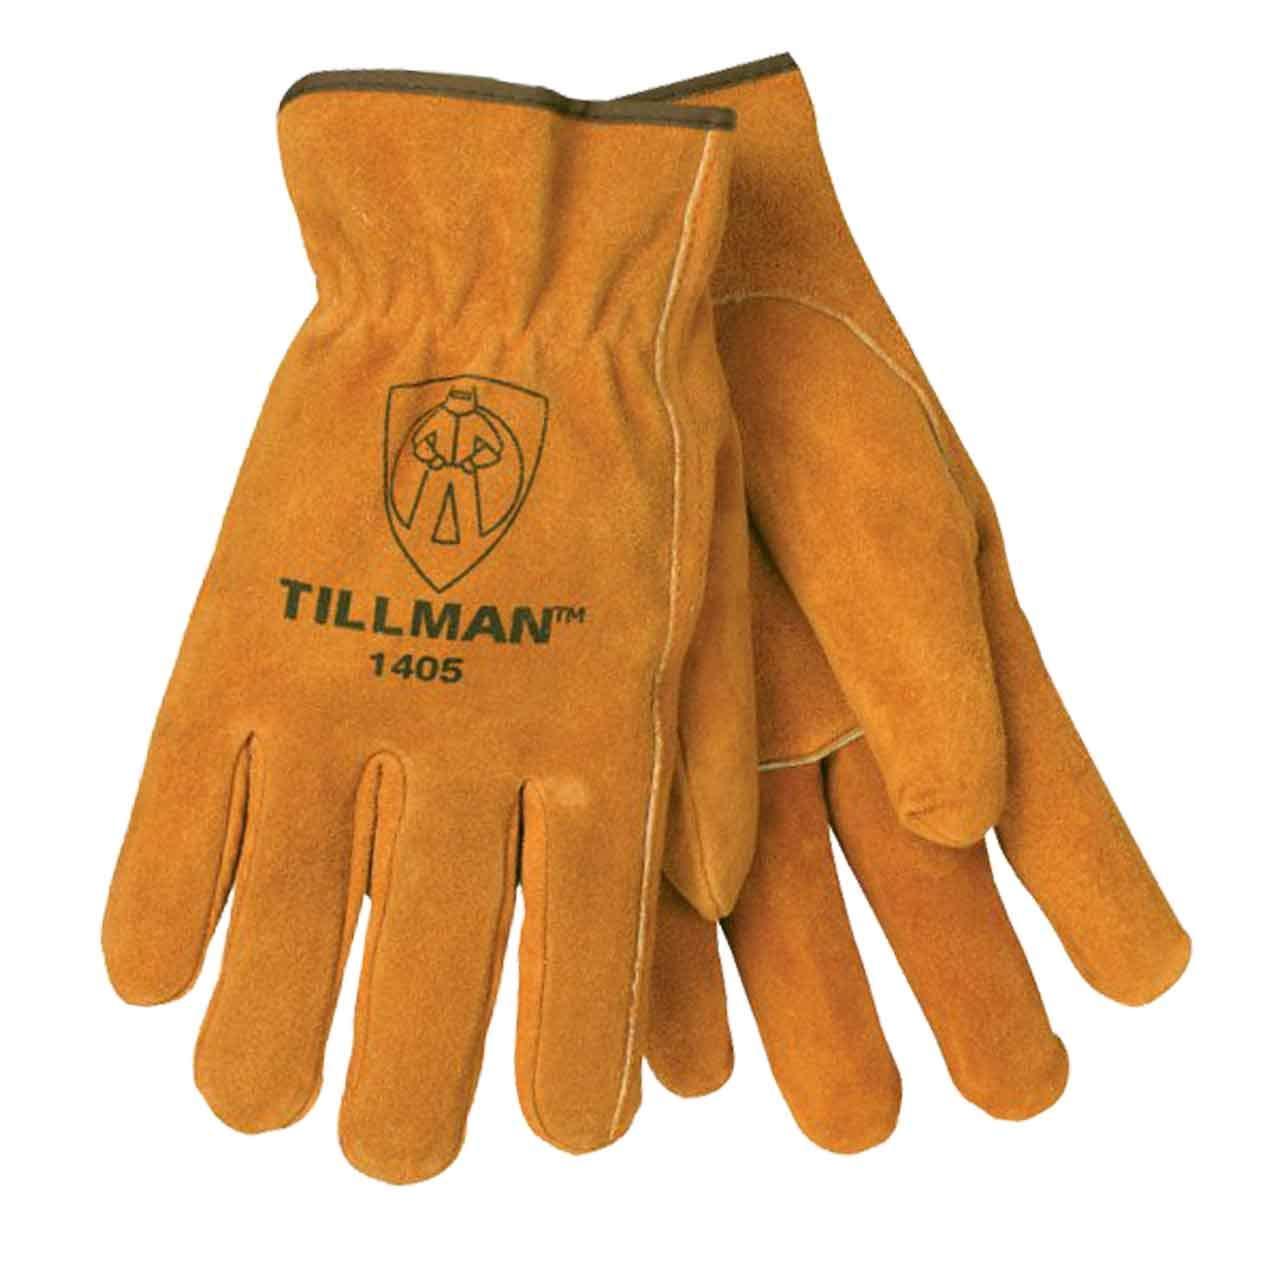 TILLMAN 1405S DRIVERS GLOVES Small Split Cowhide